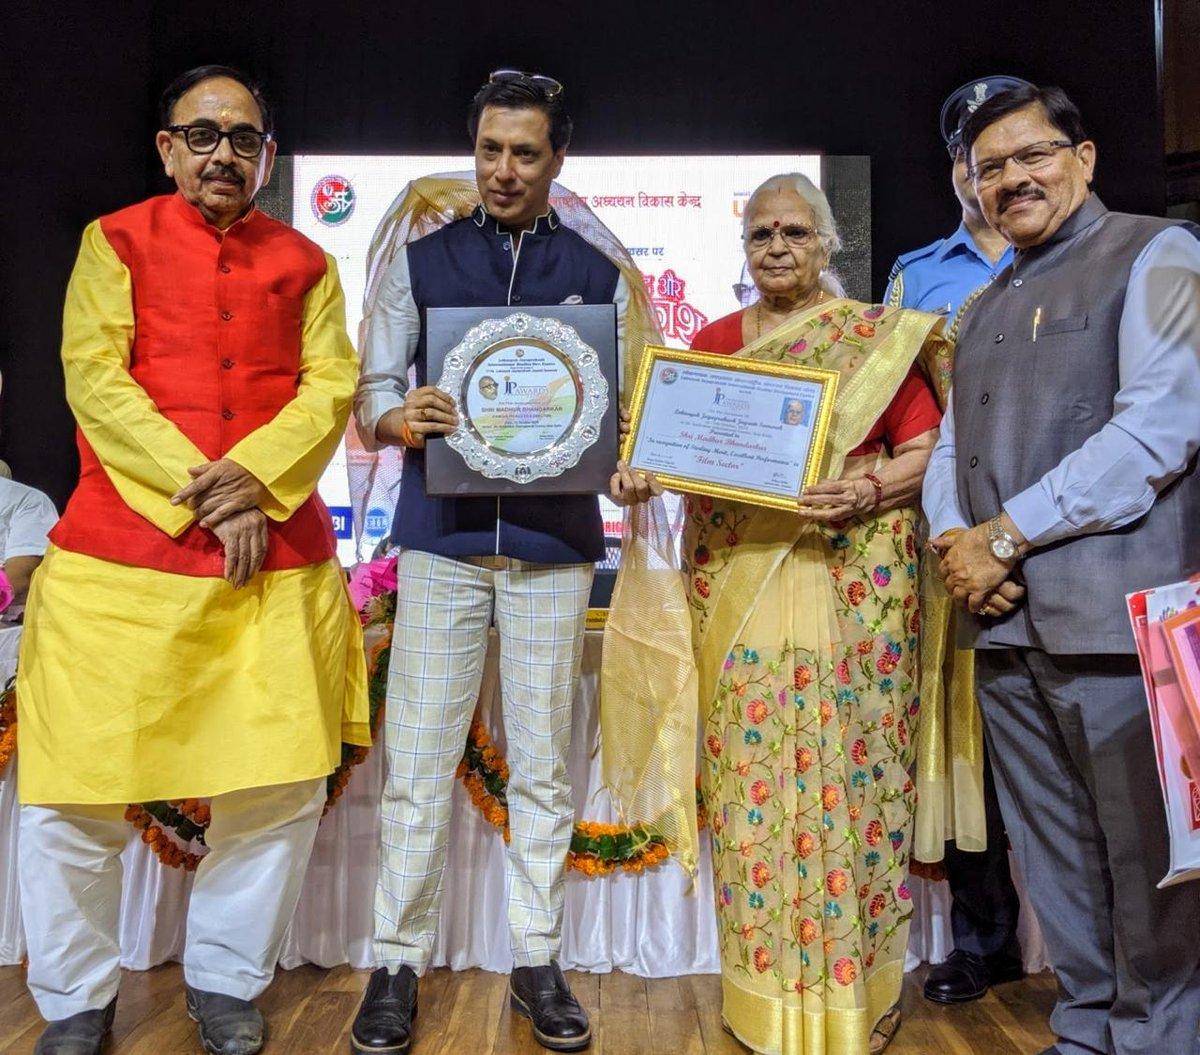 National Award Filmmaker @imbhandarkar receives the prestigious Loknayak Jayprakash Award from the Governor of Goa Mridula Sinha & Cabinet Minister Mahendra Nath Pandey in Delhi today..